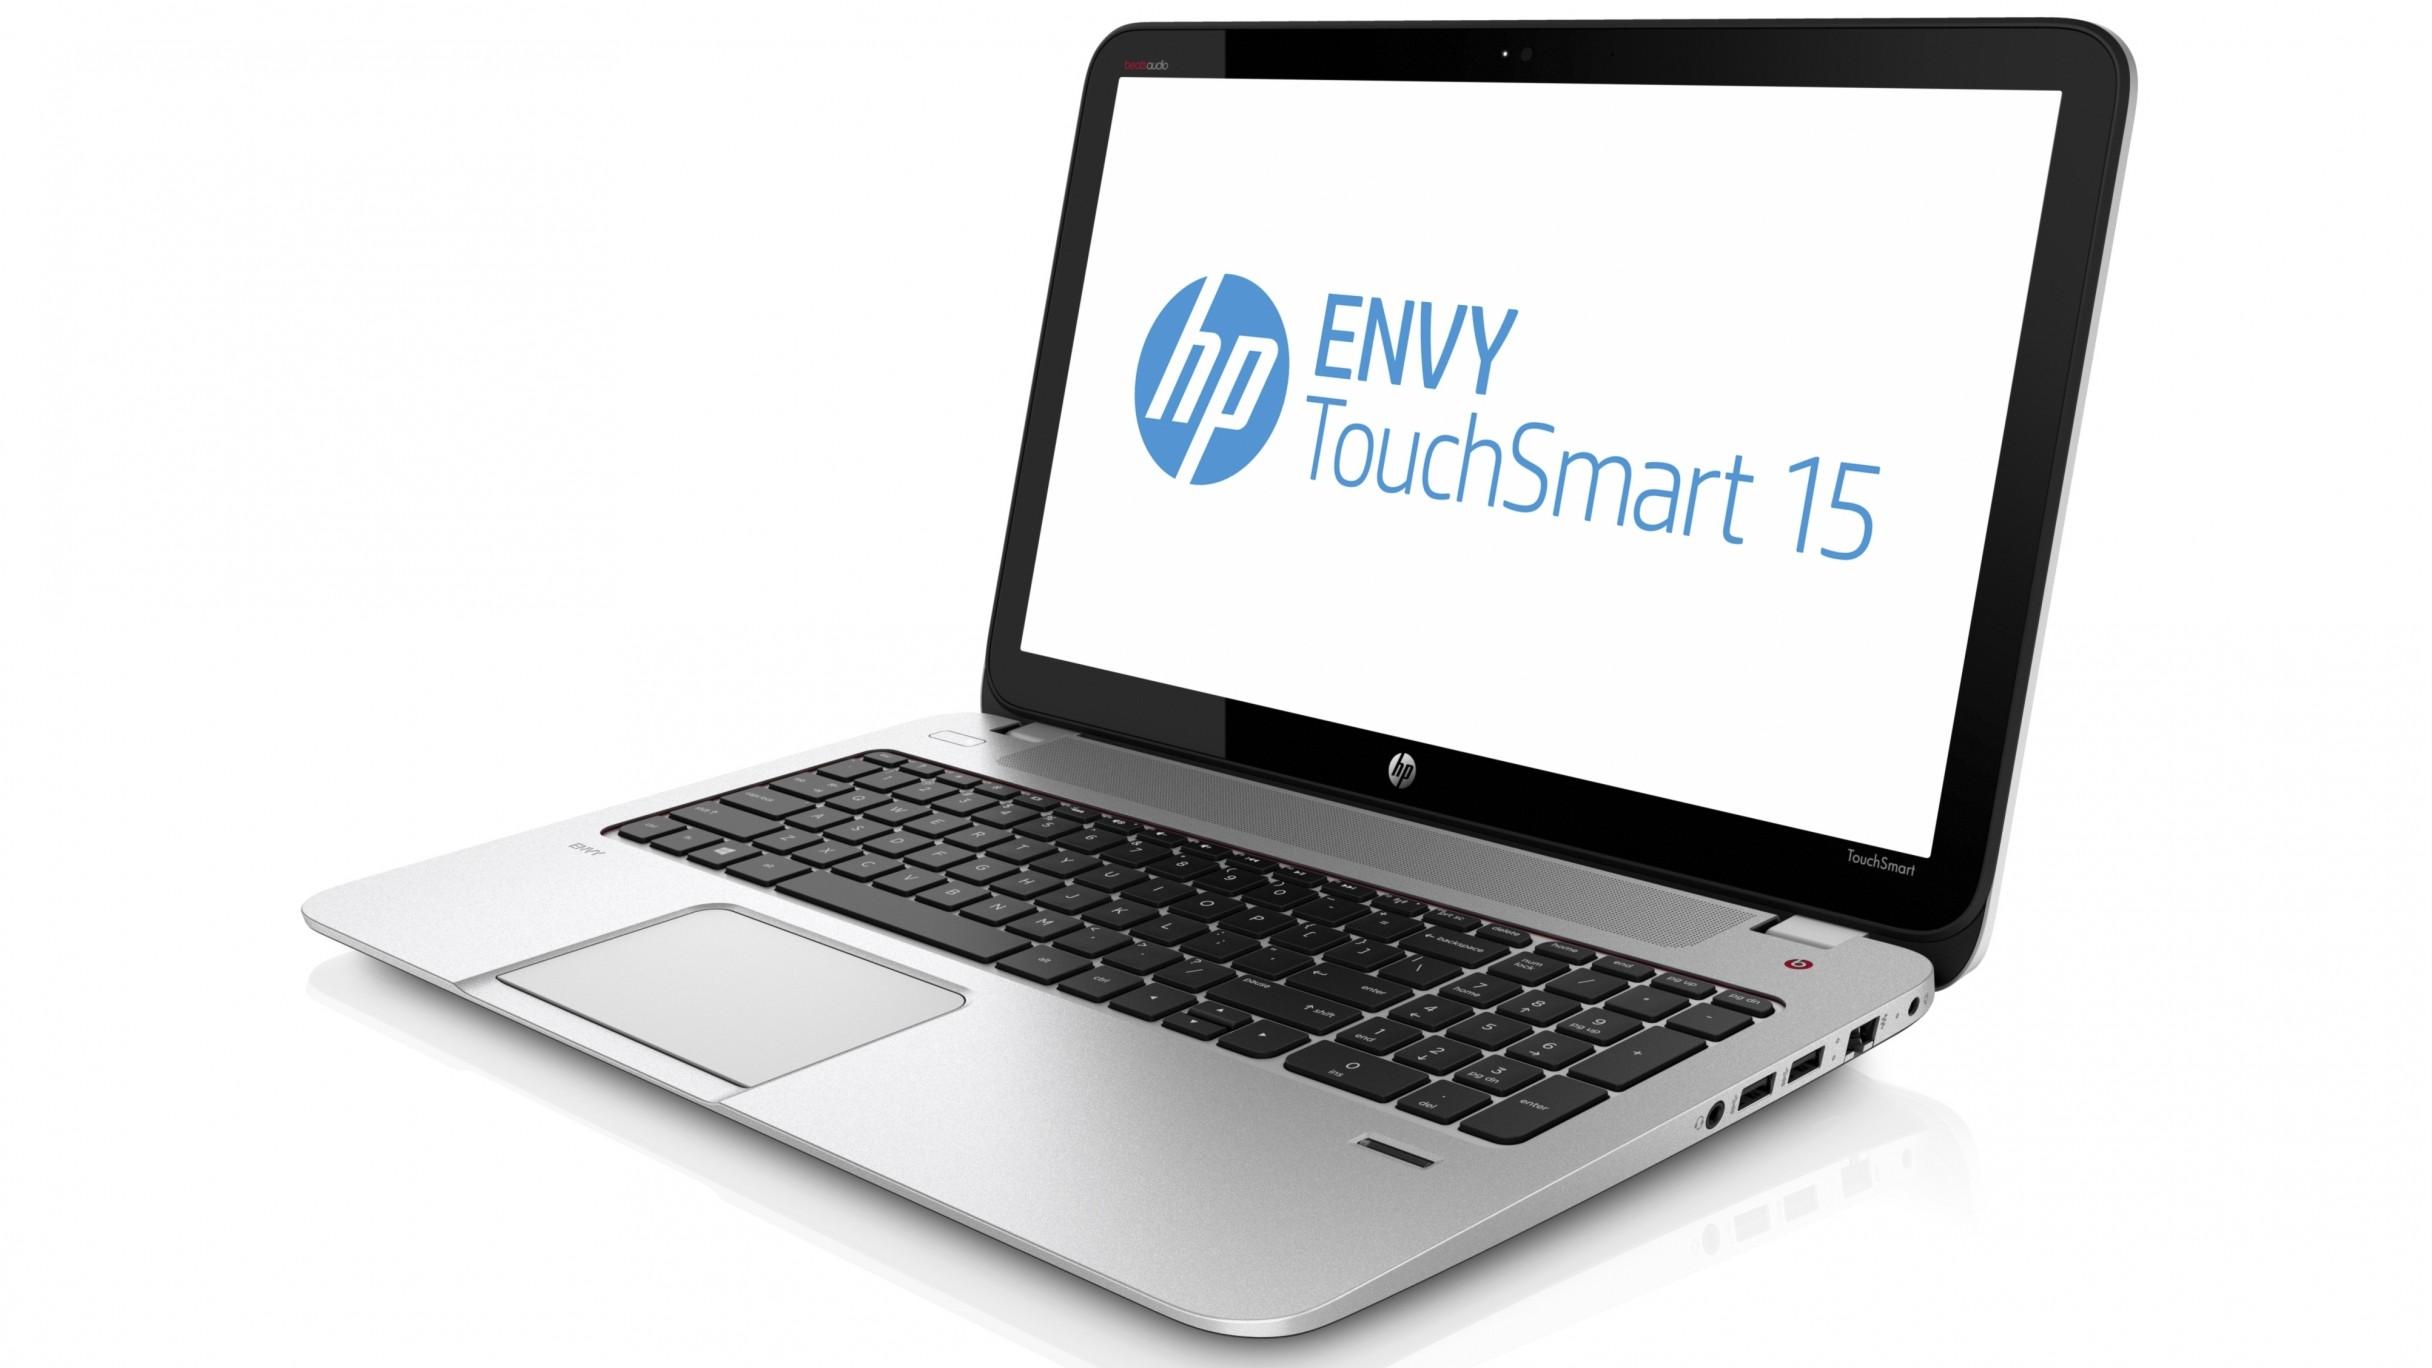 HP ENVY 15t-j000 Intel WLAN Driver for Windows Download